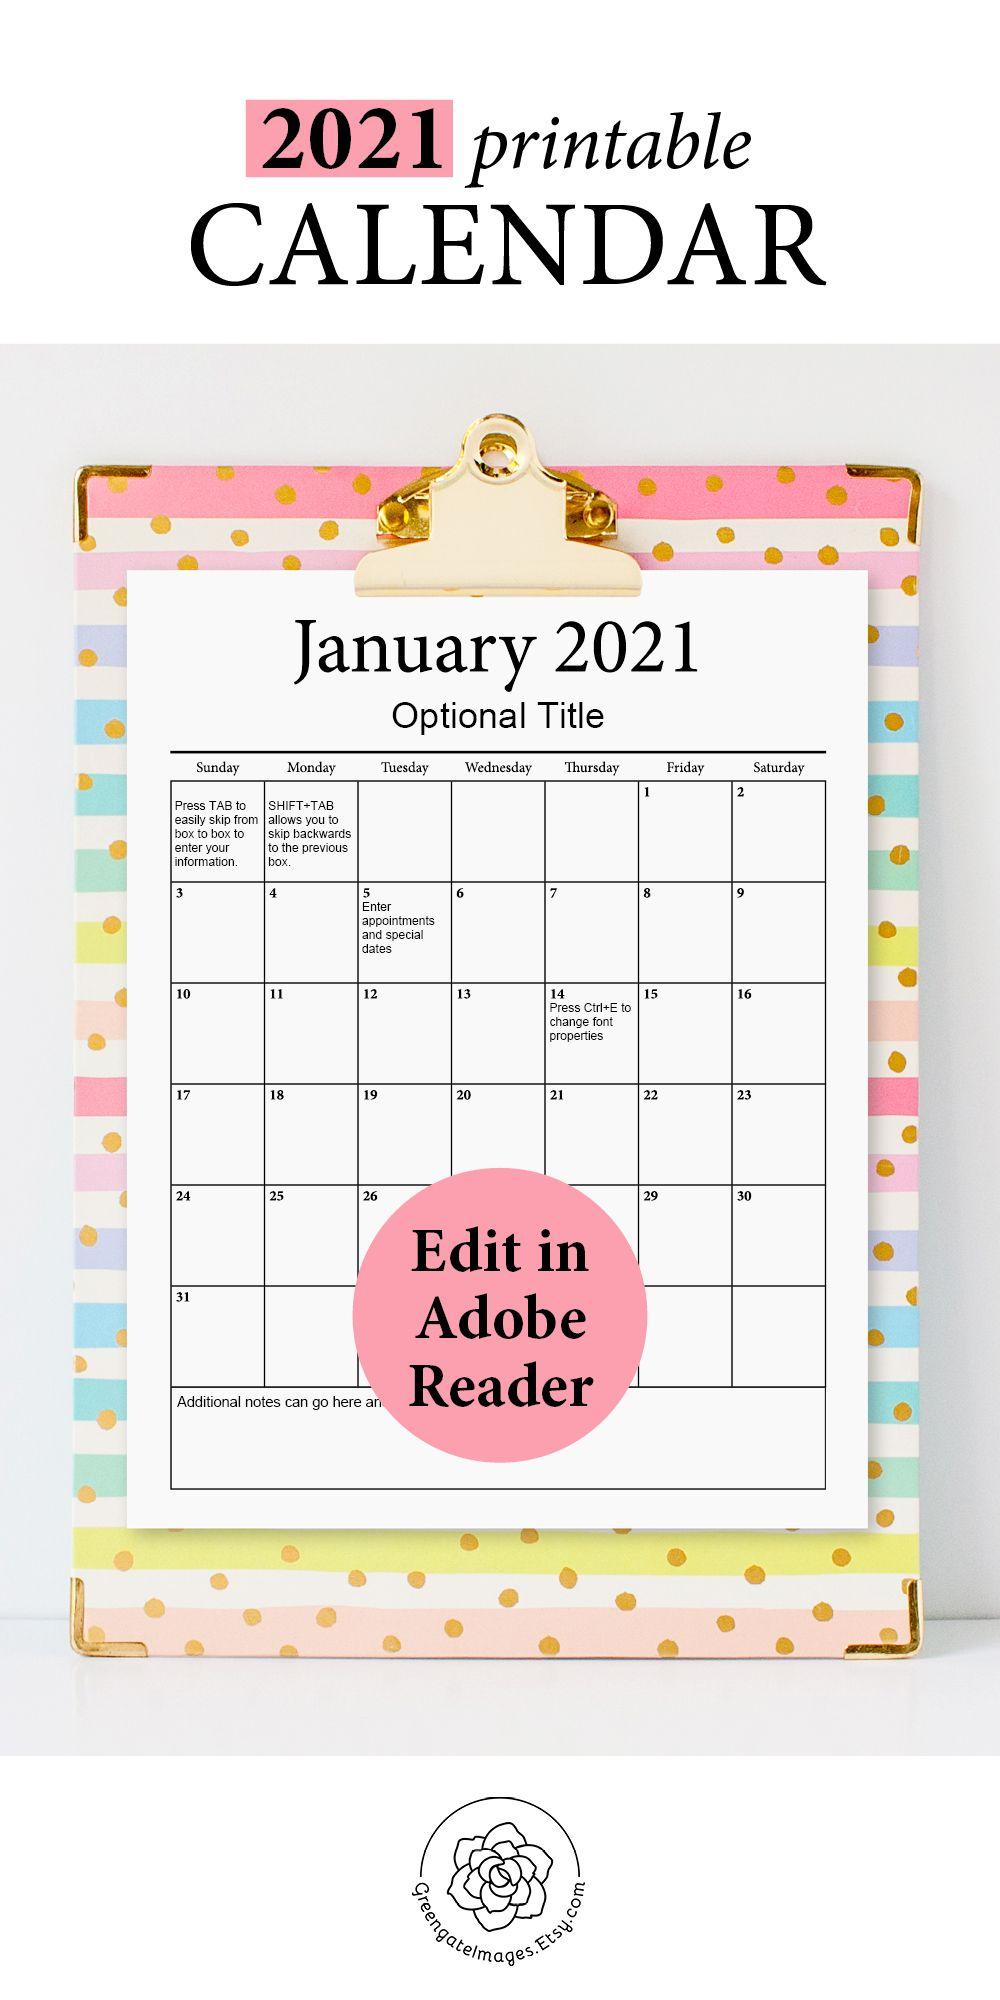 2021 Printable Calendar - Fillable Planner Editable Pdf